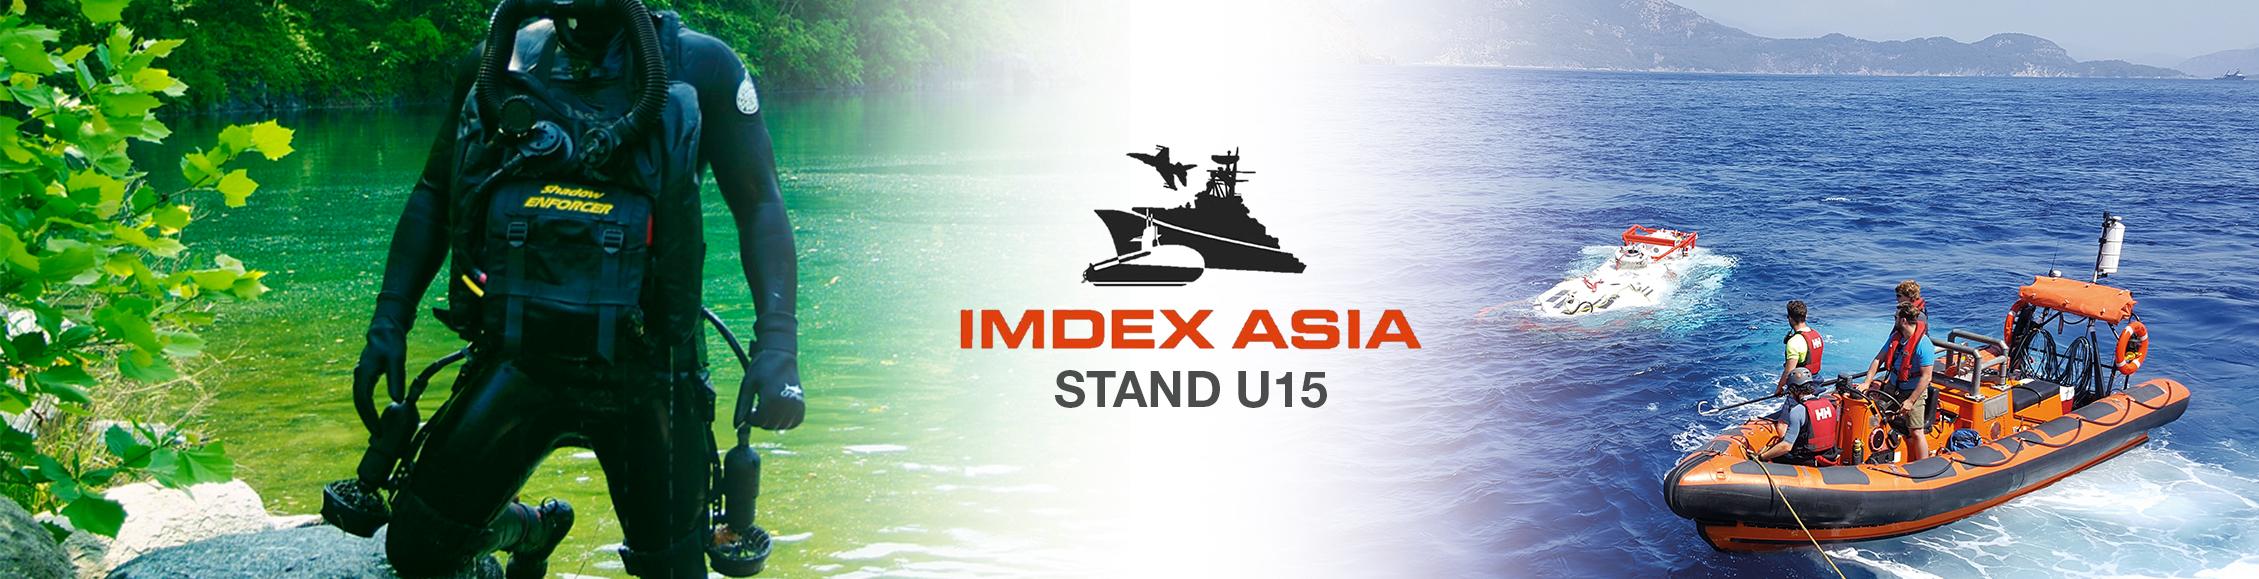 JFD | See JFD at IMDEX Asia 2019